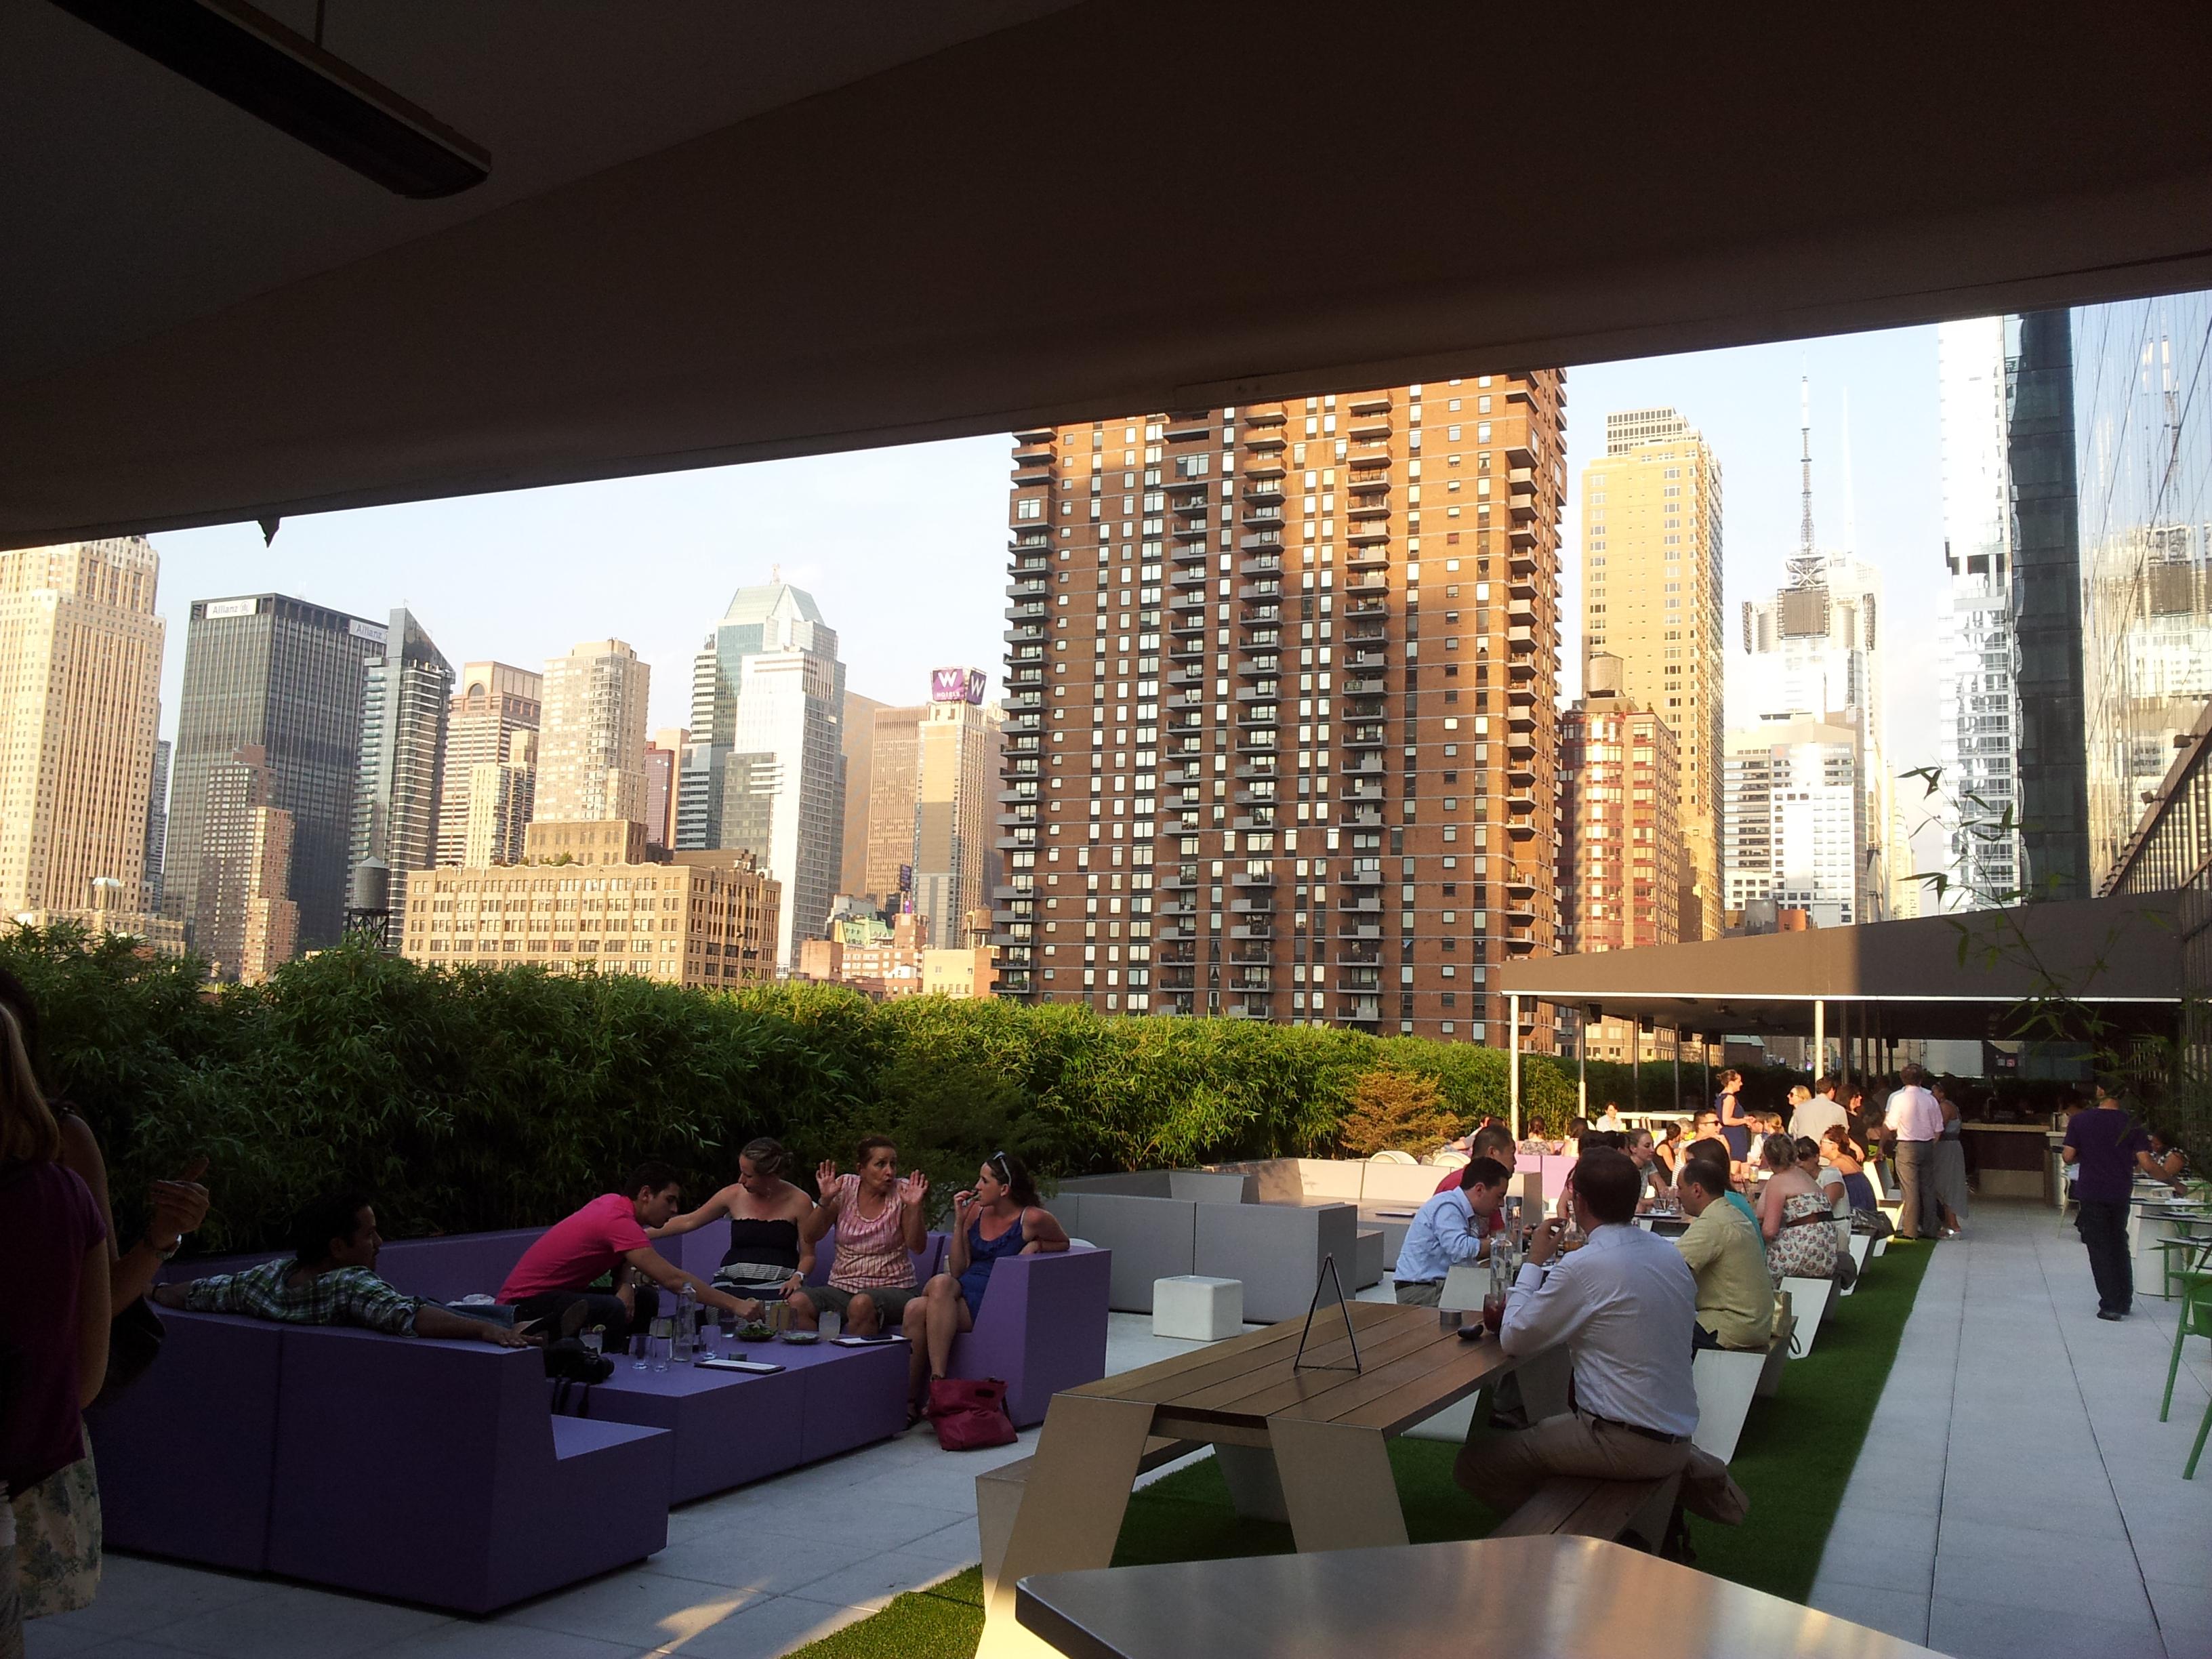 Yotel Nyc Rooftop